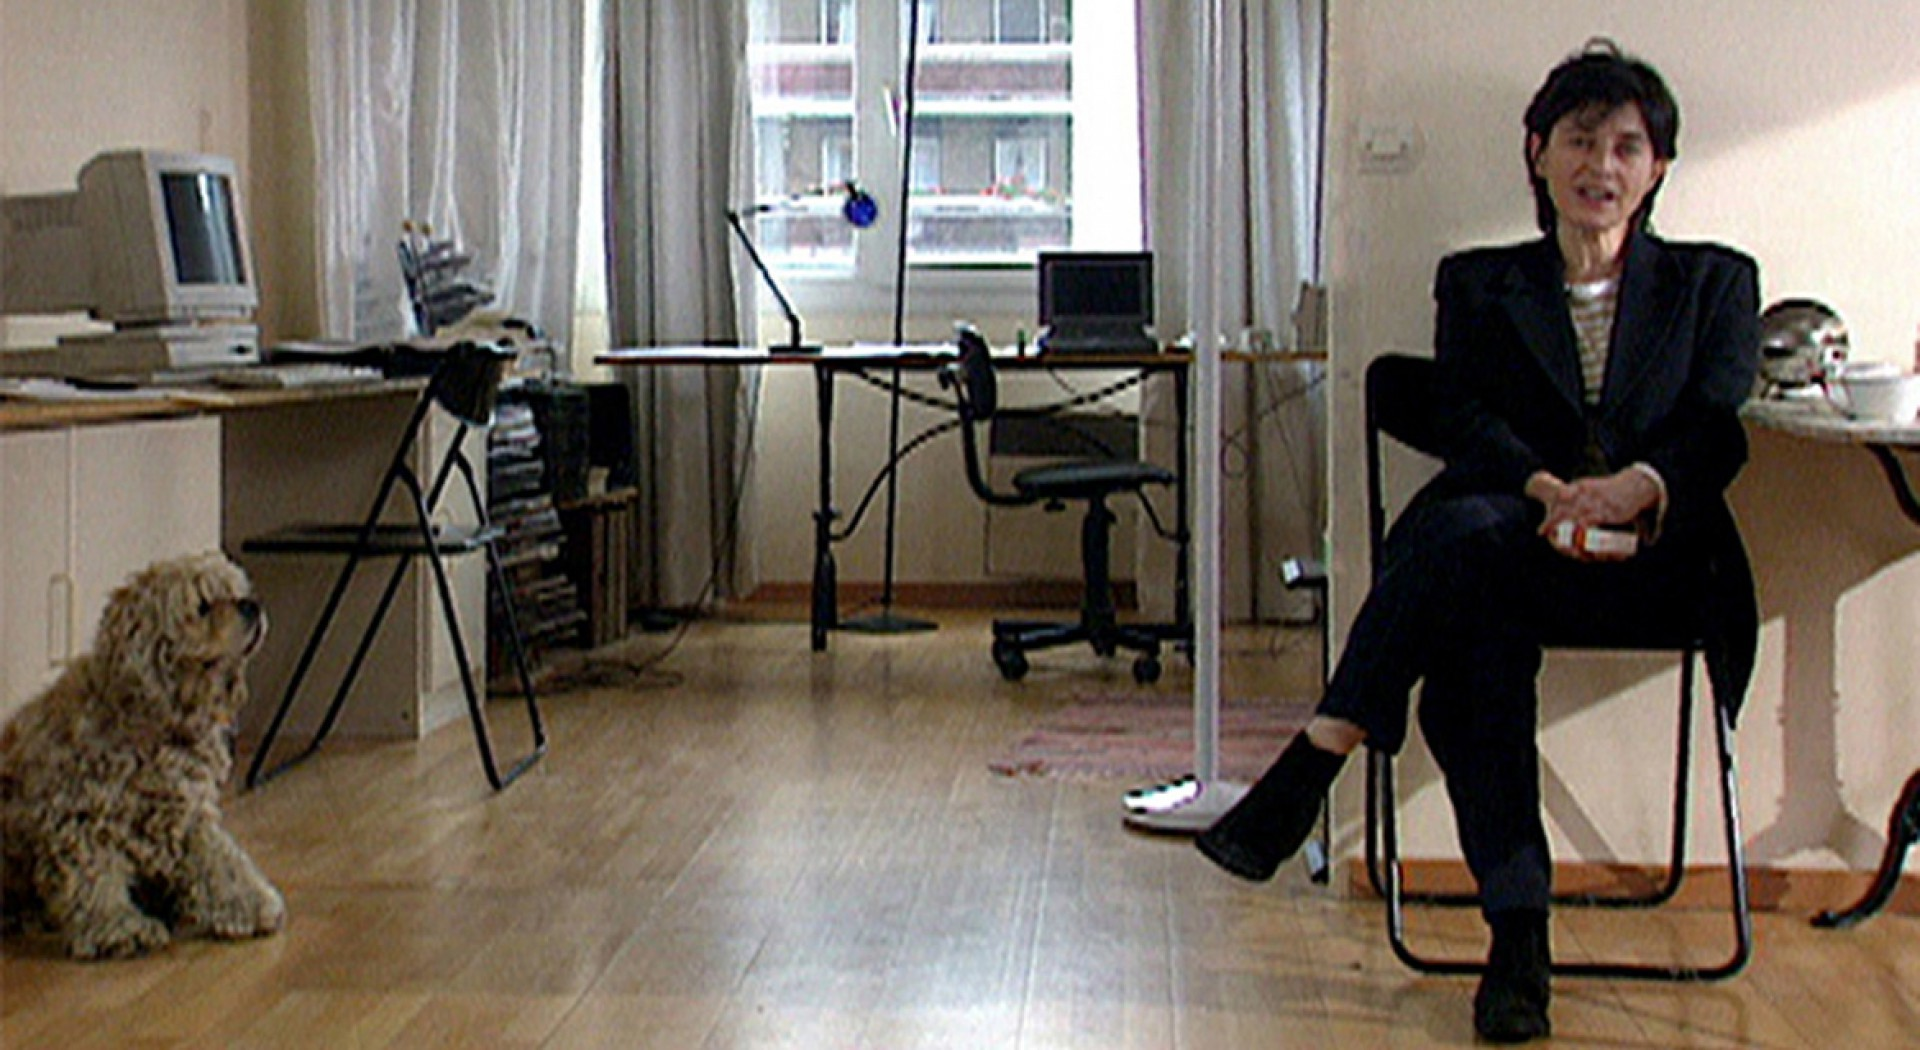 A cineasta durante gravação de Chantal Akerman por Chantal Akerman